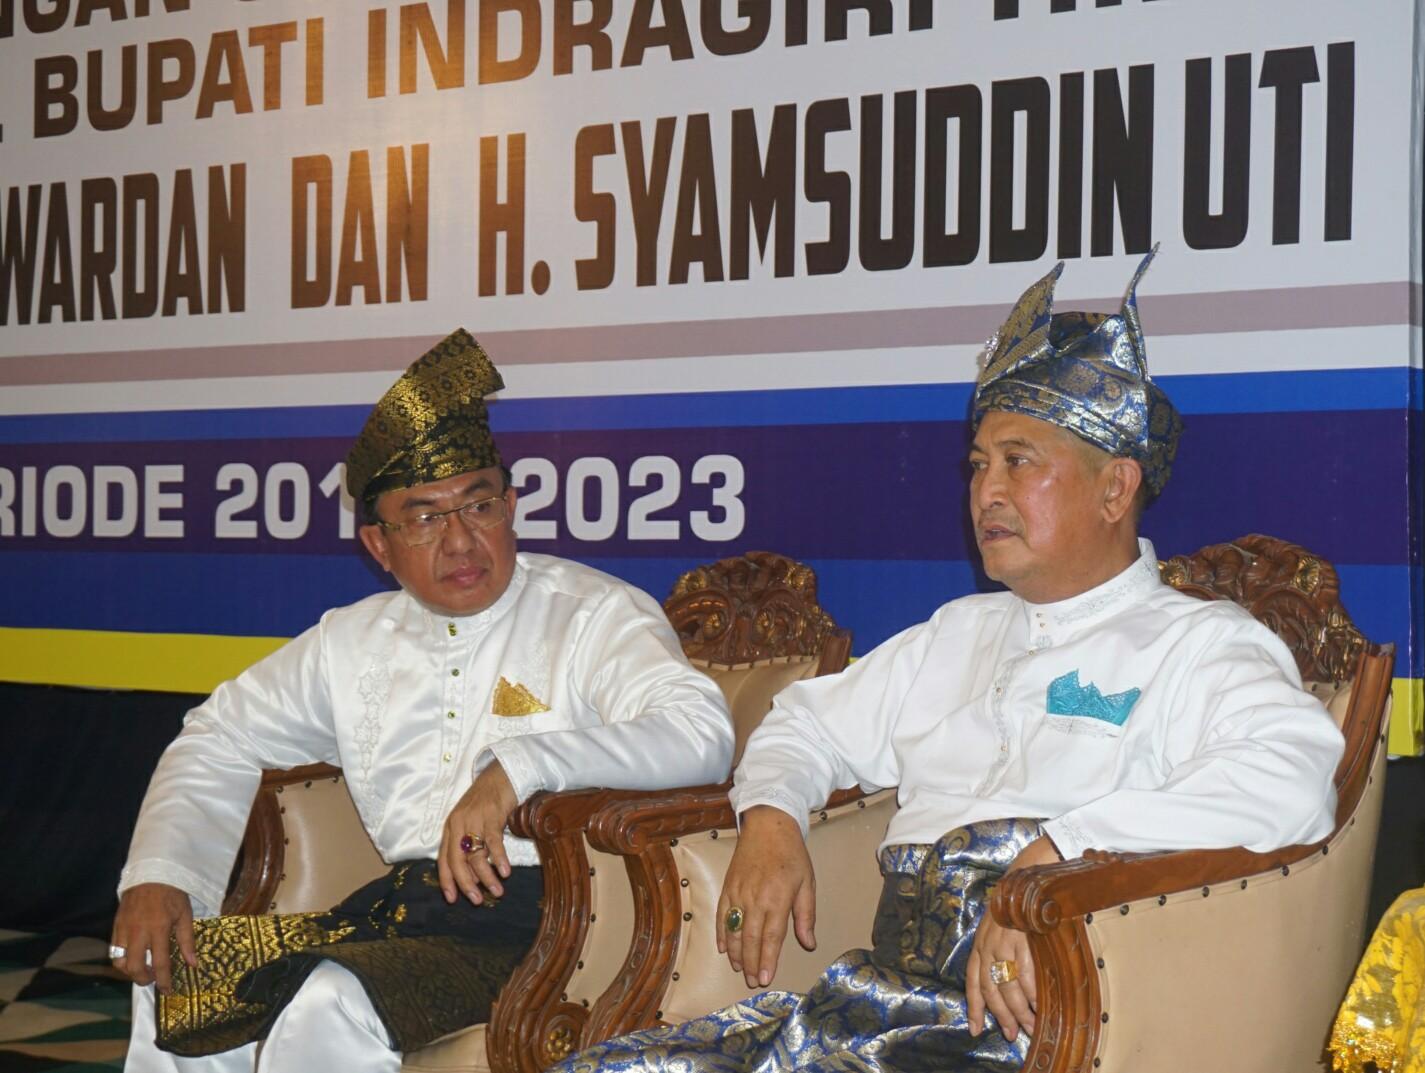 Pilkada Serentak 2018, Wardan - SU Resmi Berpasangan Sebagai Calon Bupati Dan Wakil Bupati Inhil